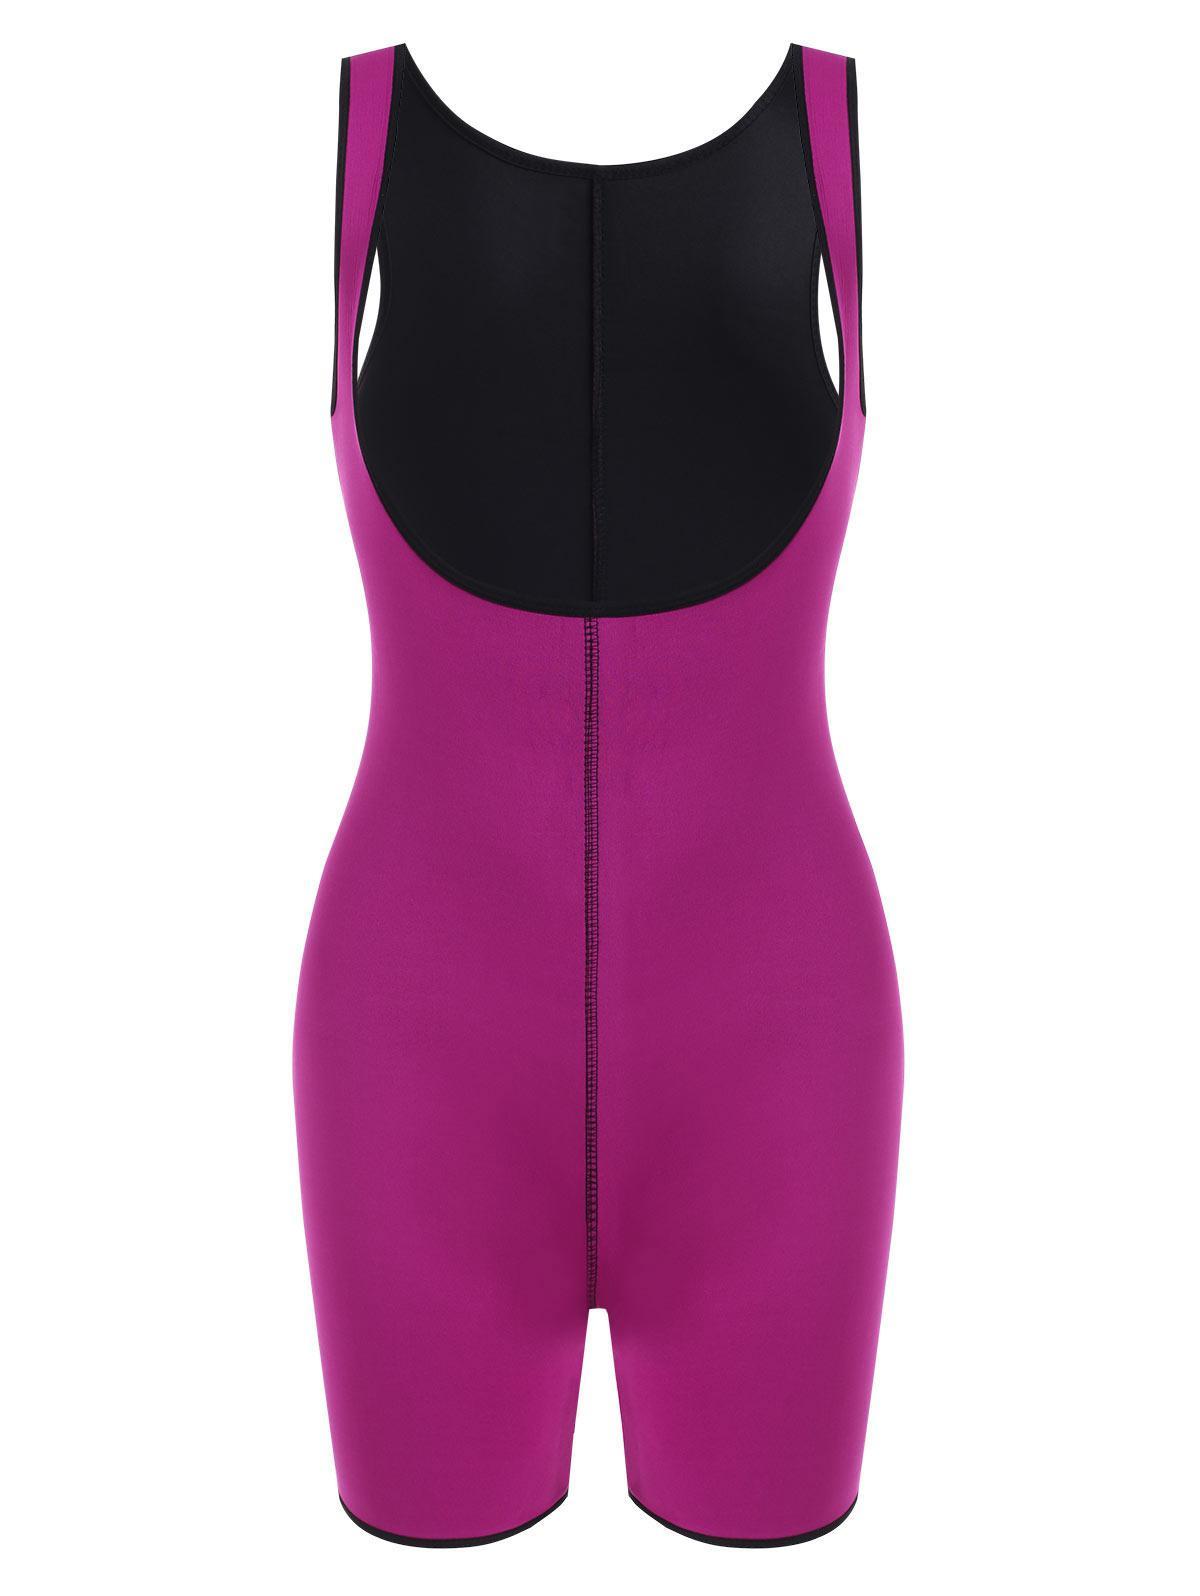 Open Bust Topstitching Slimming Corset Bodysuit Shaper